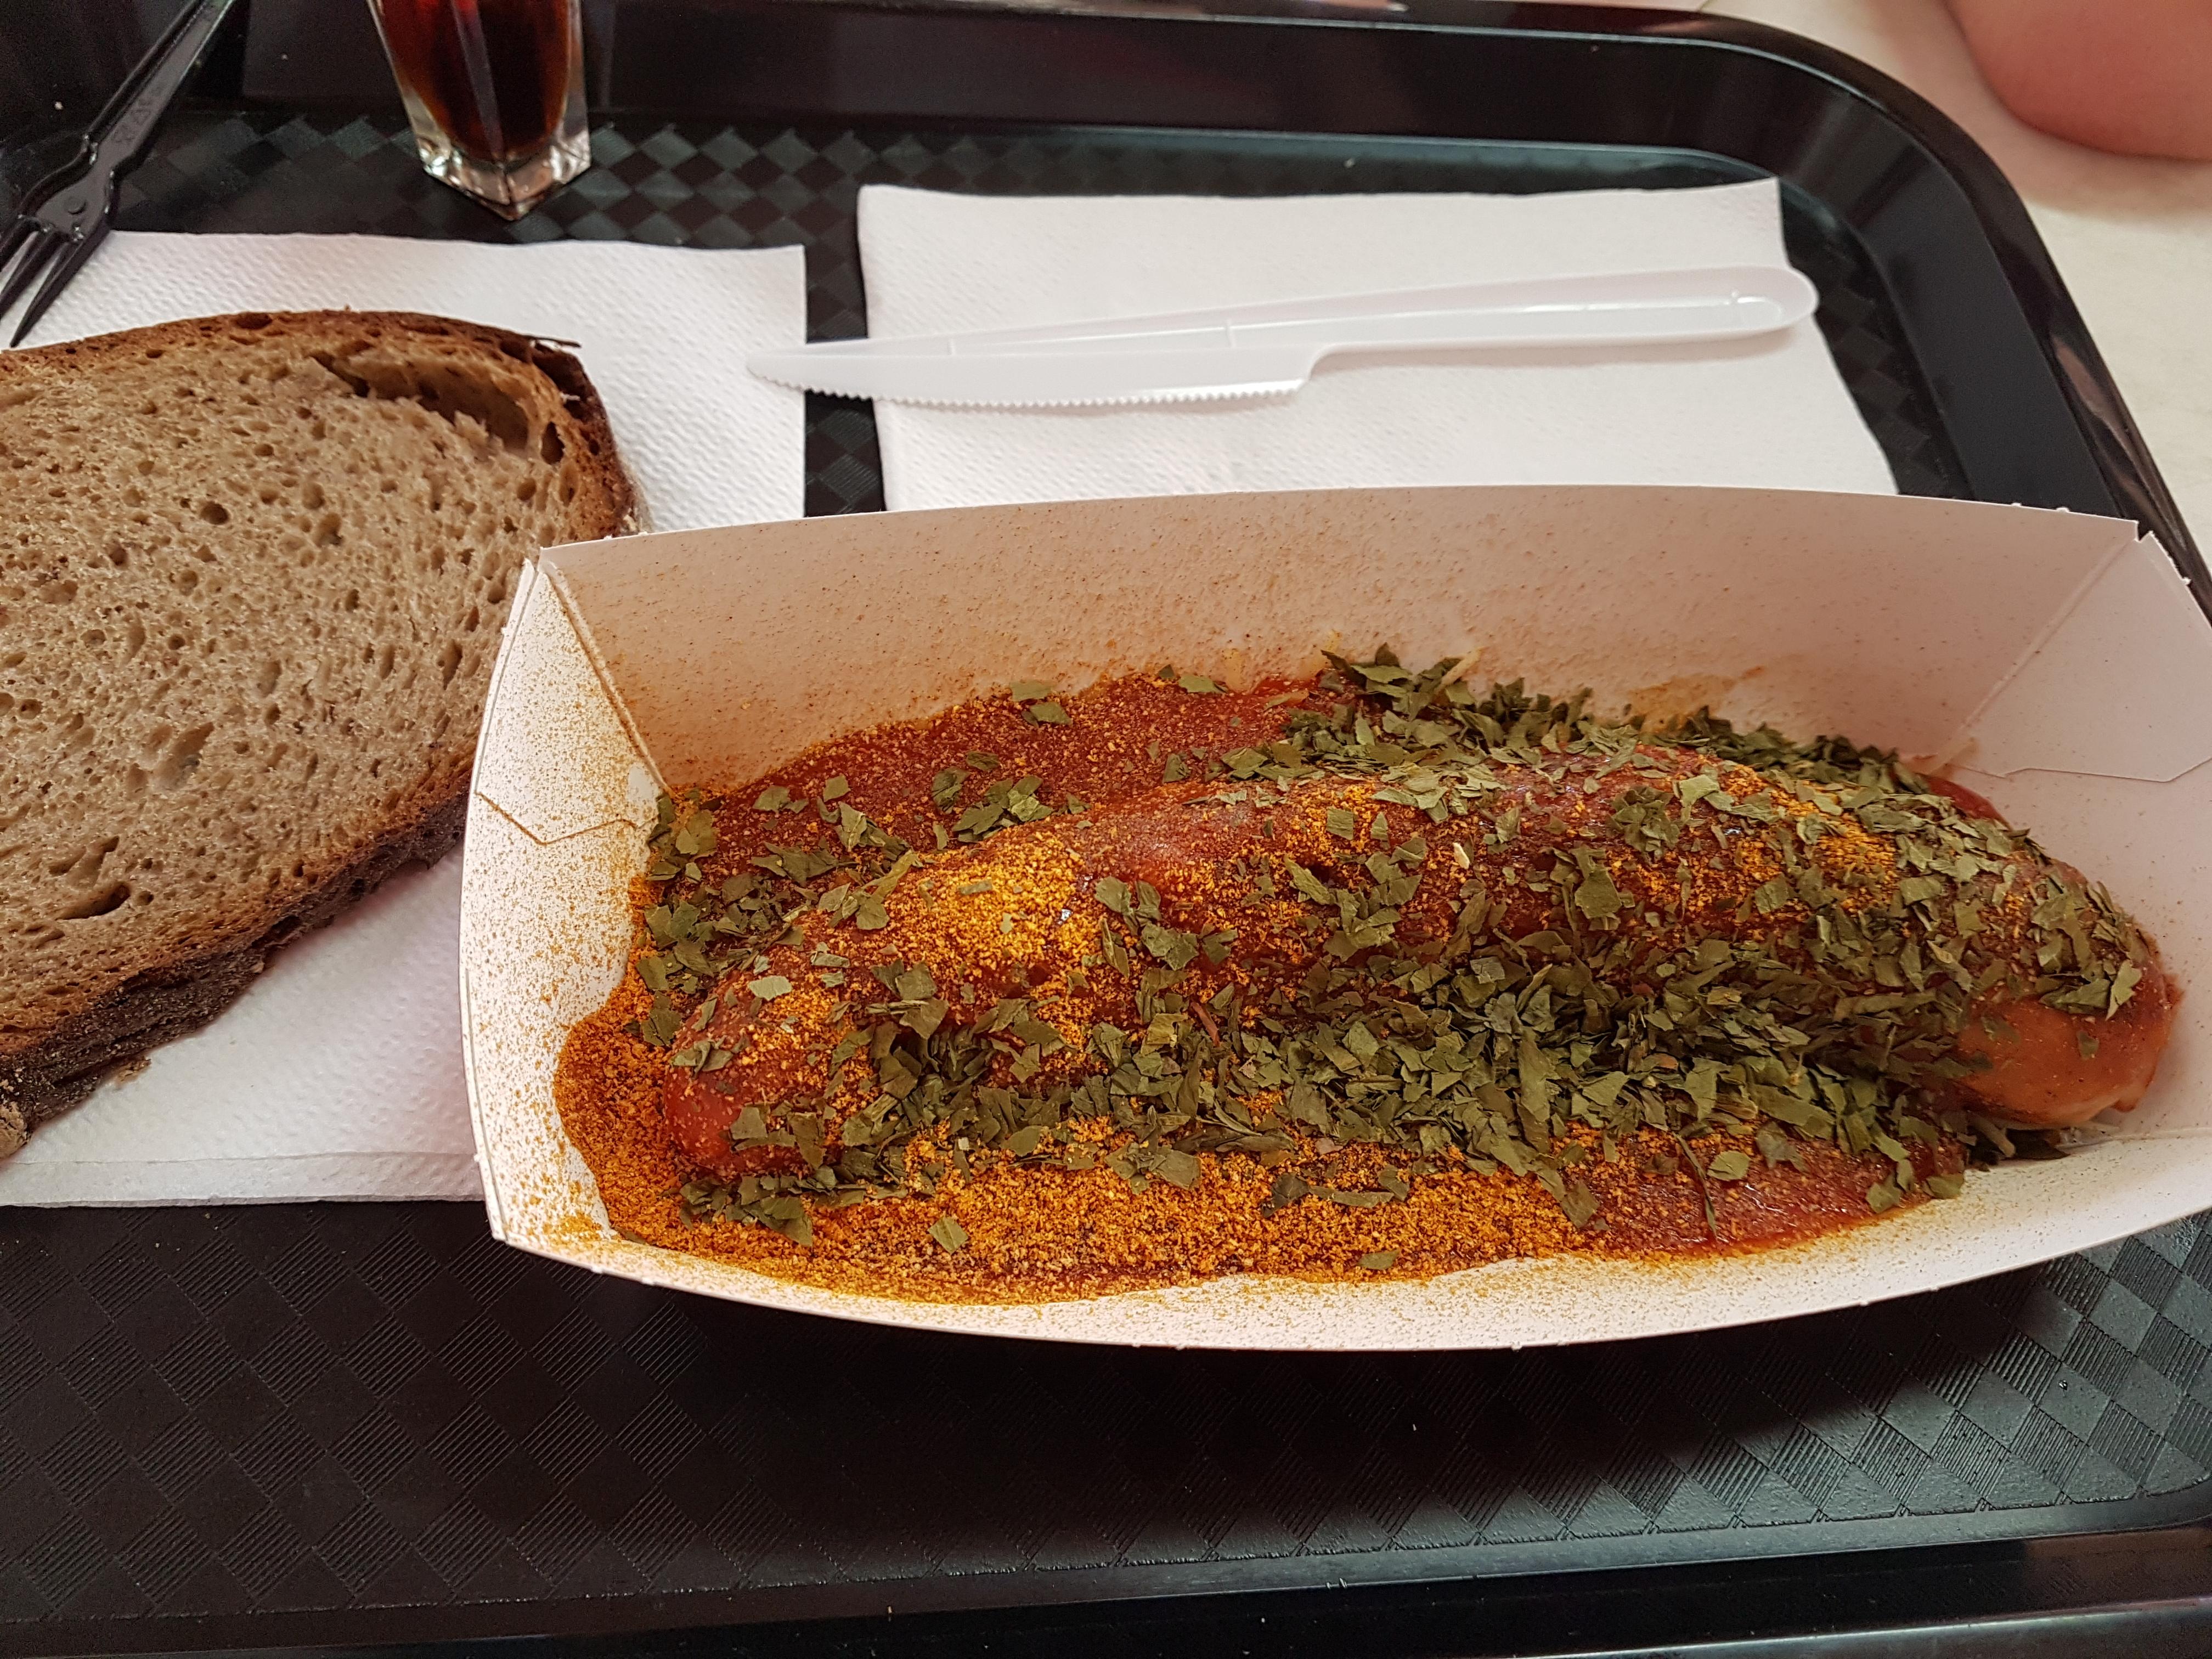 http://foodloader.net/Holz_2017-04-24_DJ_Duese_Wurst.jpg